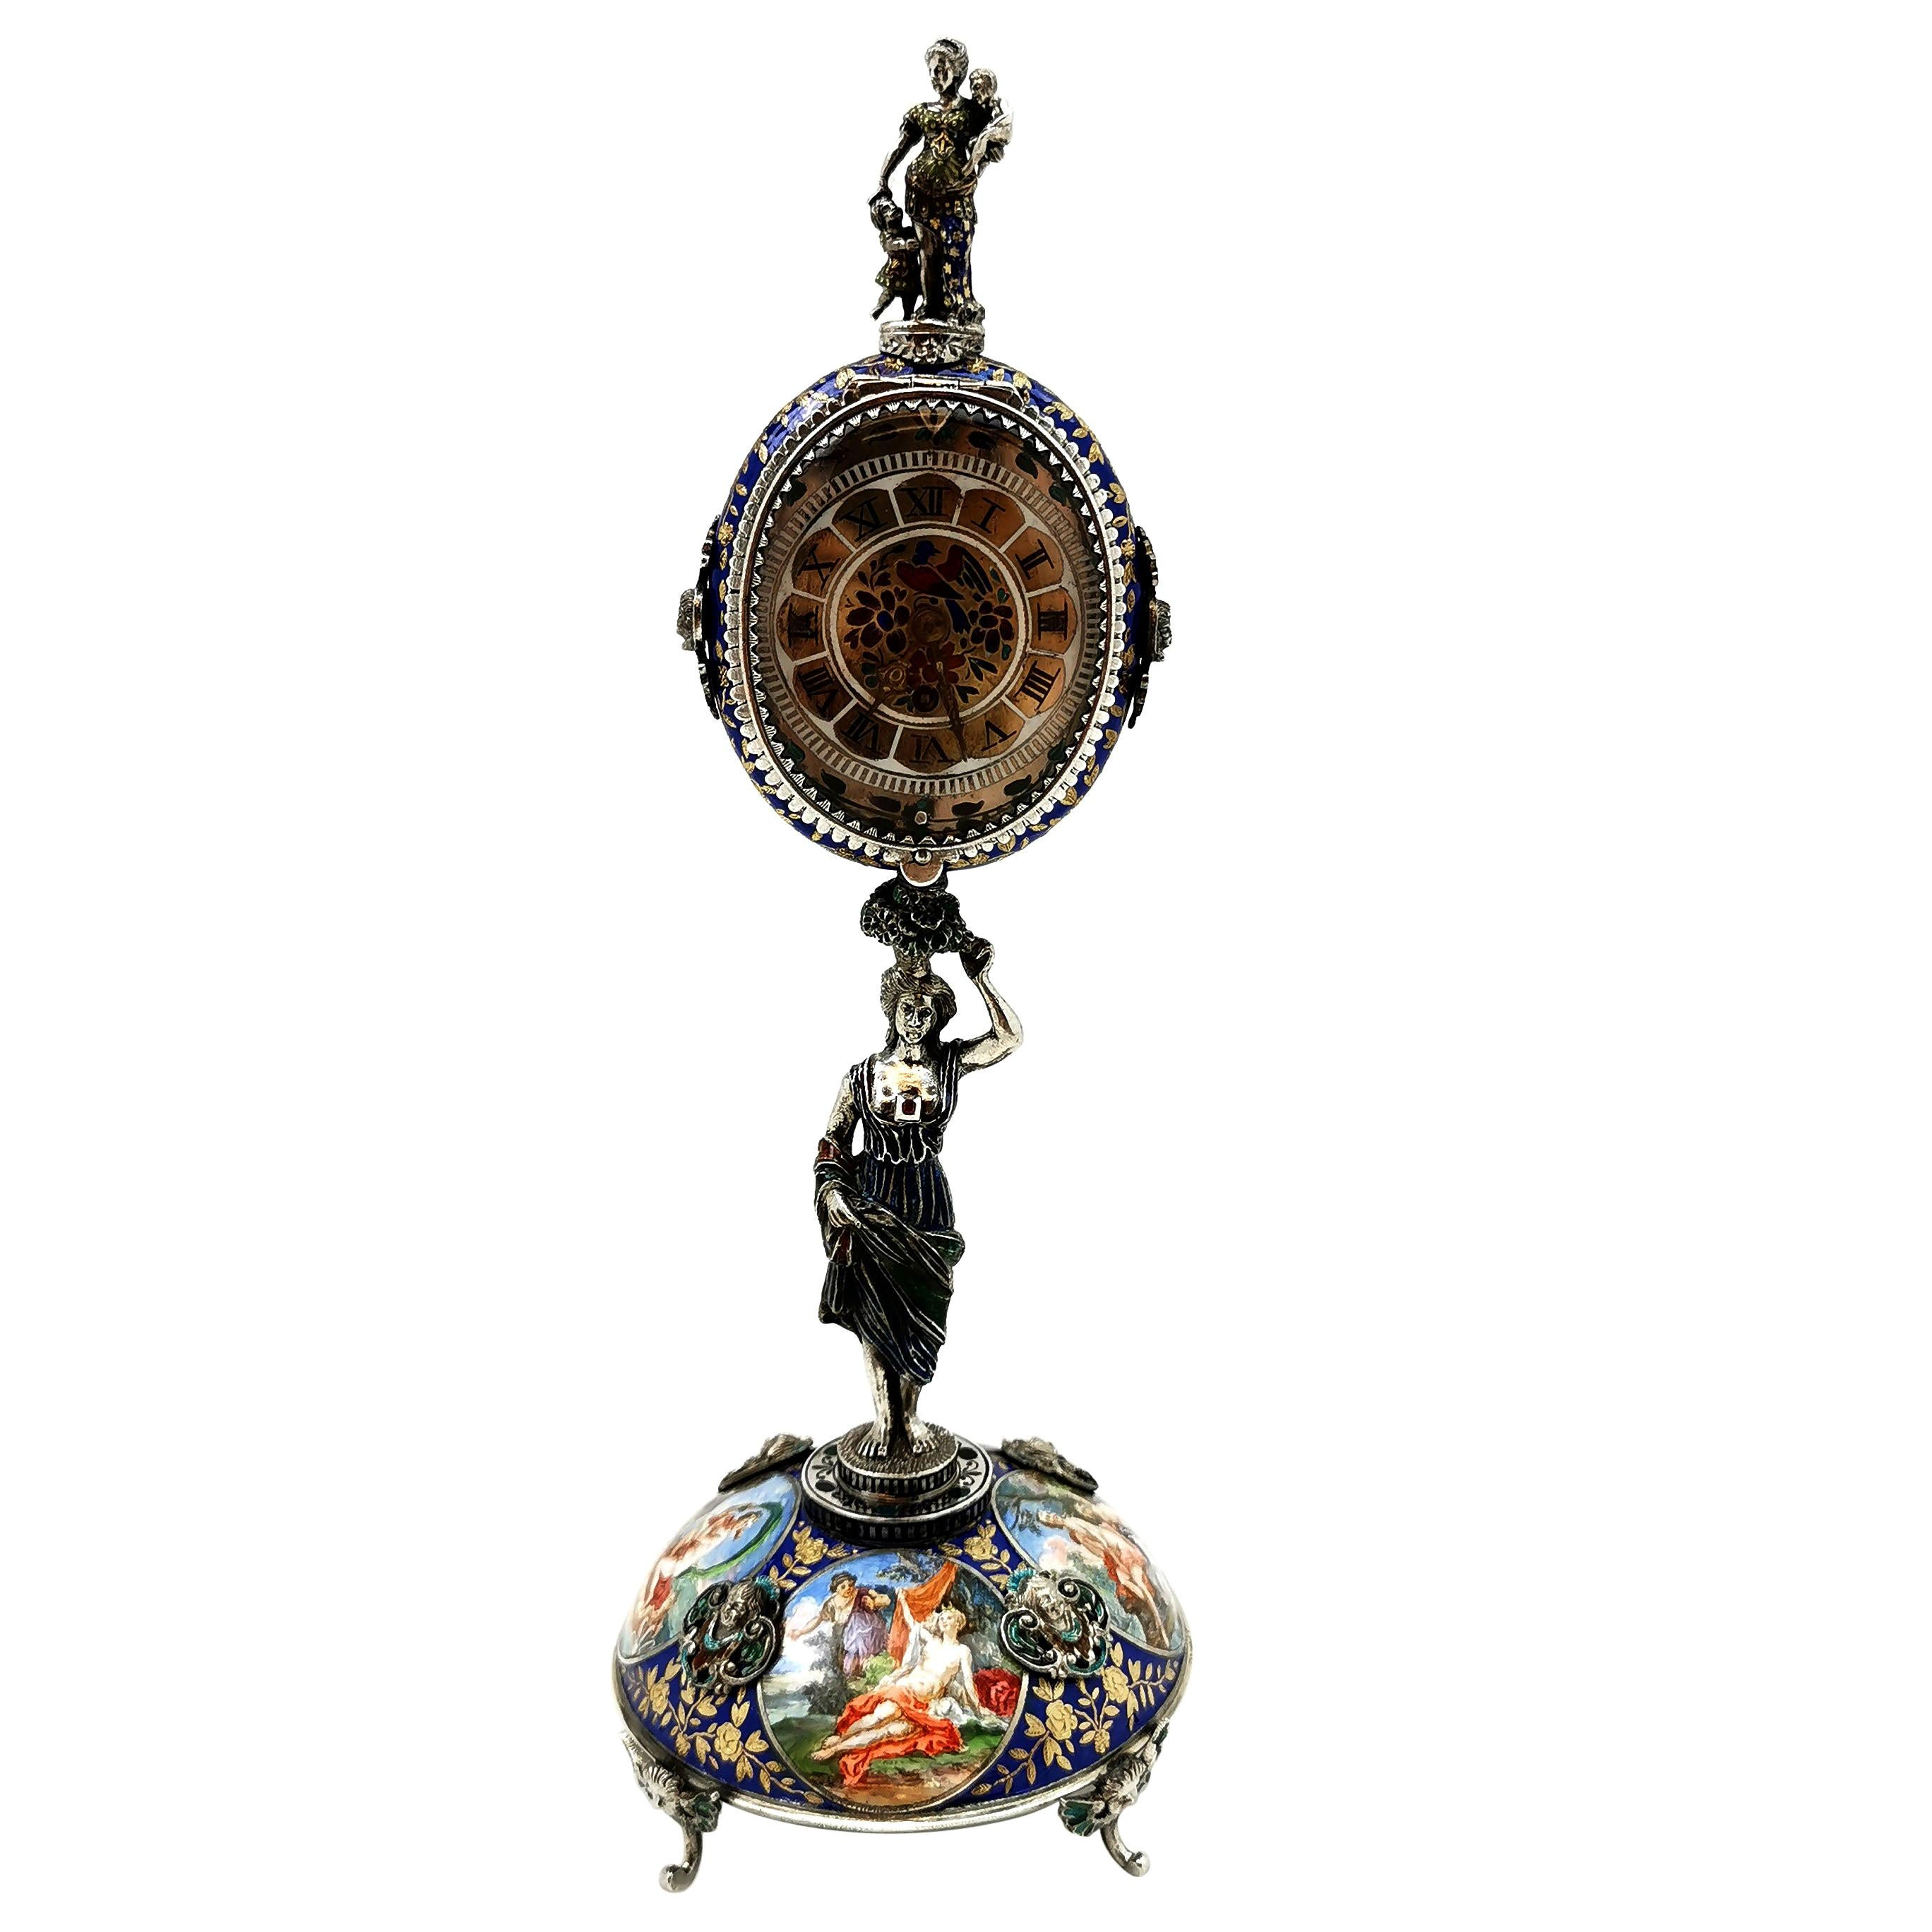 Antique Viennese Enamel and Silver Table Clock Vienna Austria circa 1870